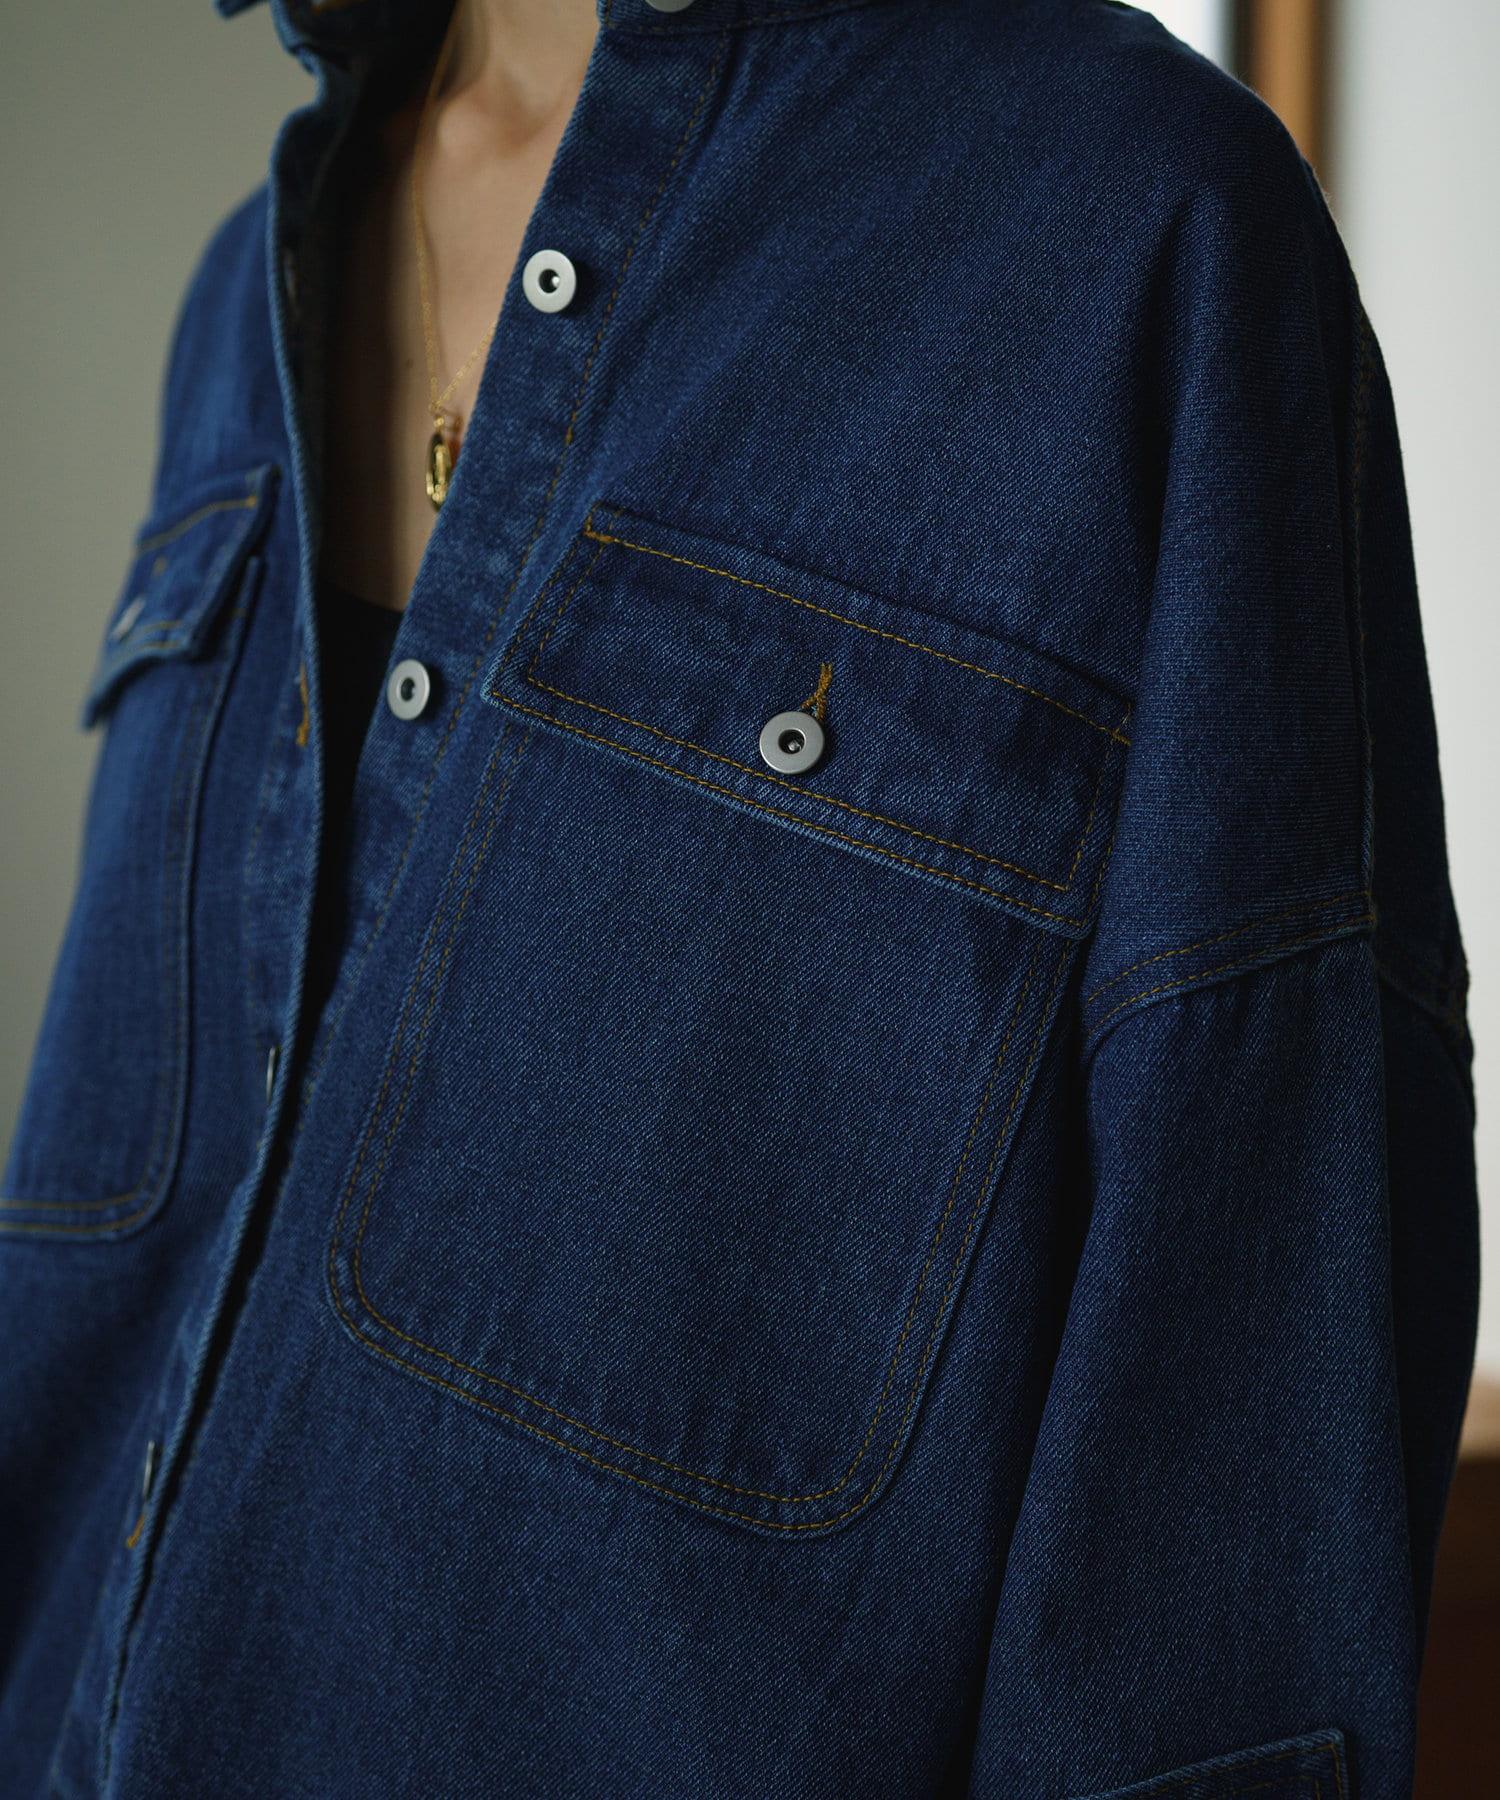 Loungedress(ラウンジドレス) オーバーデニムジャケット